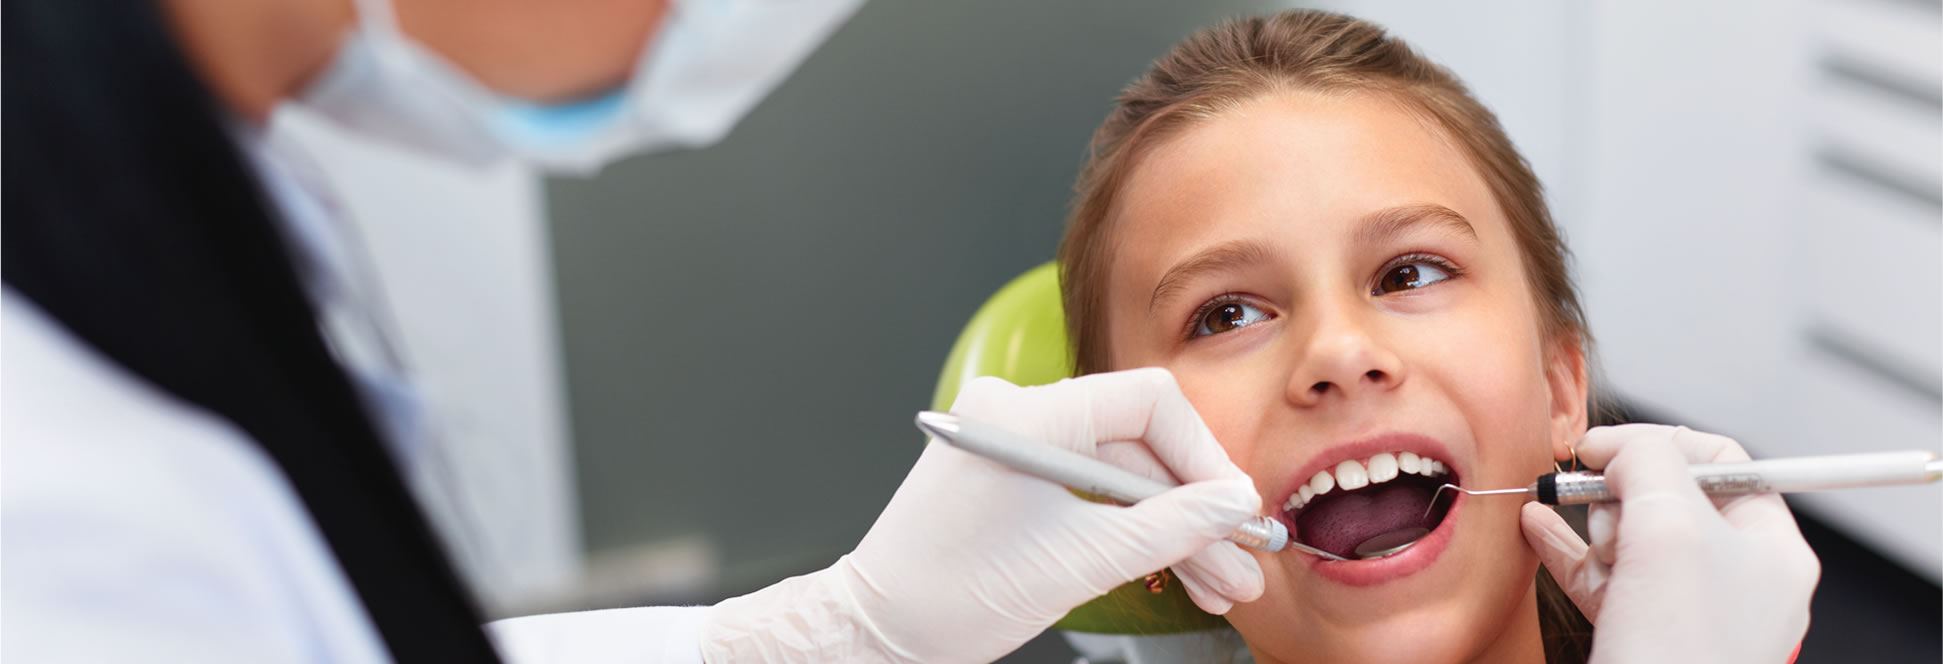 miriam-grady-dental-practice-banner